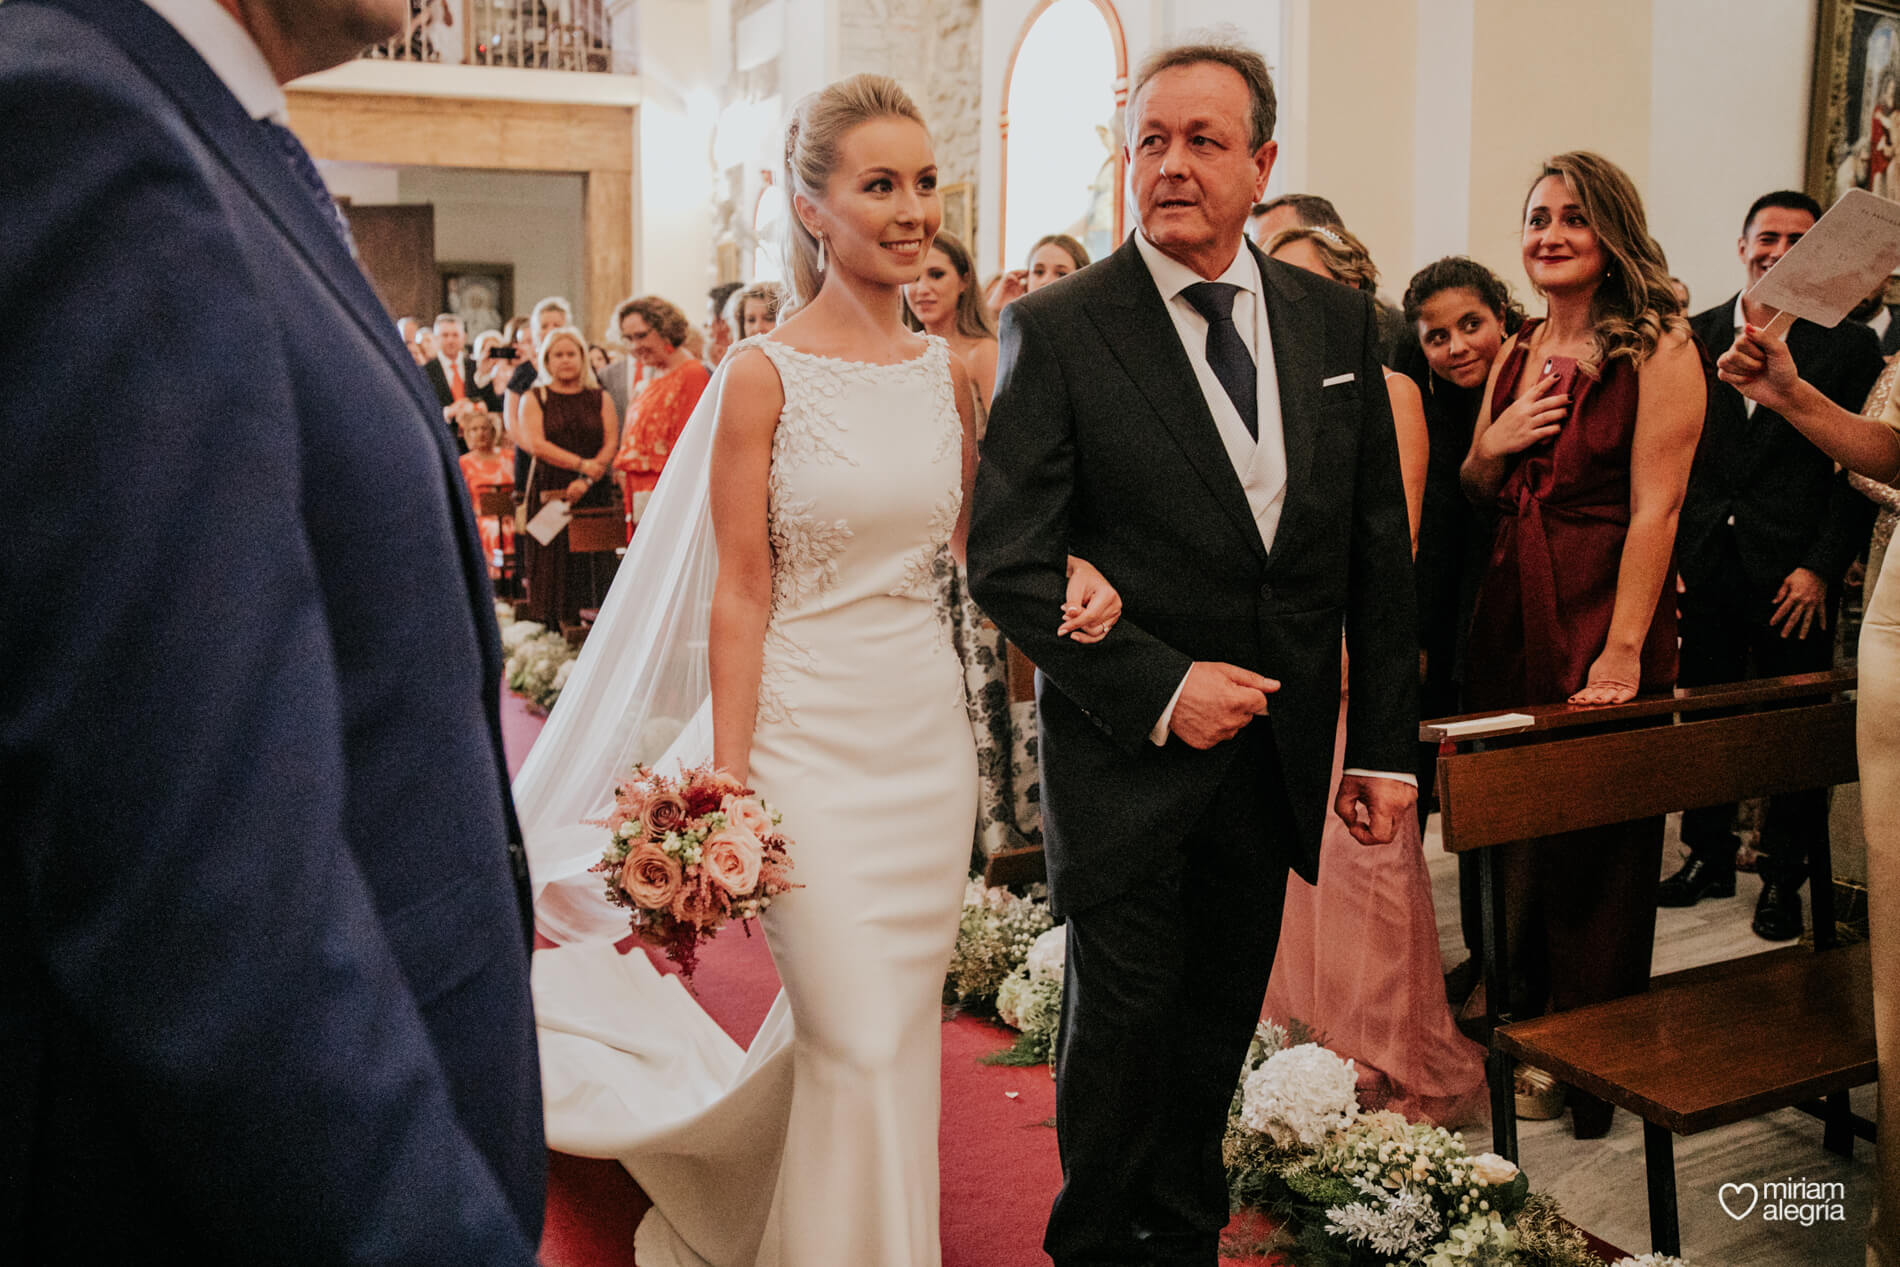 boda-en-almeria-miriam-alegria-77